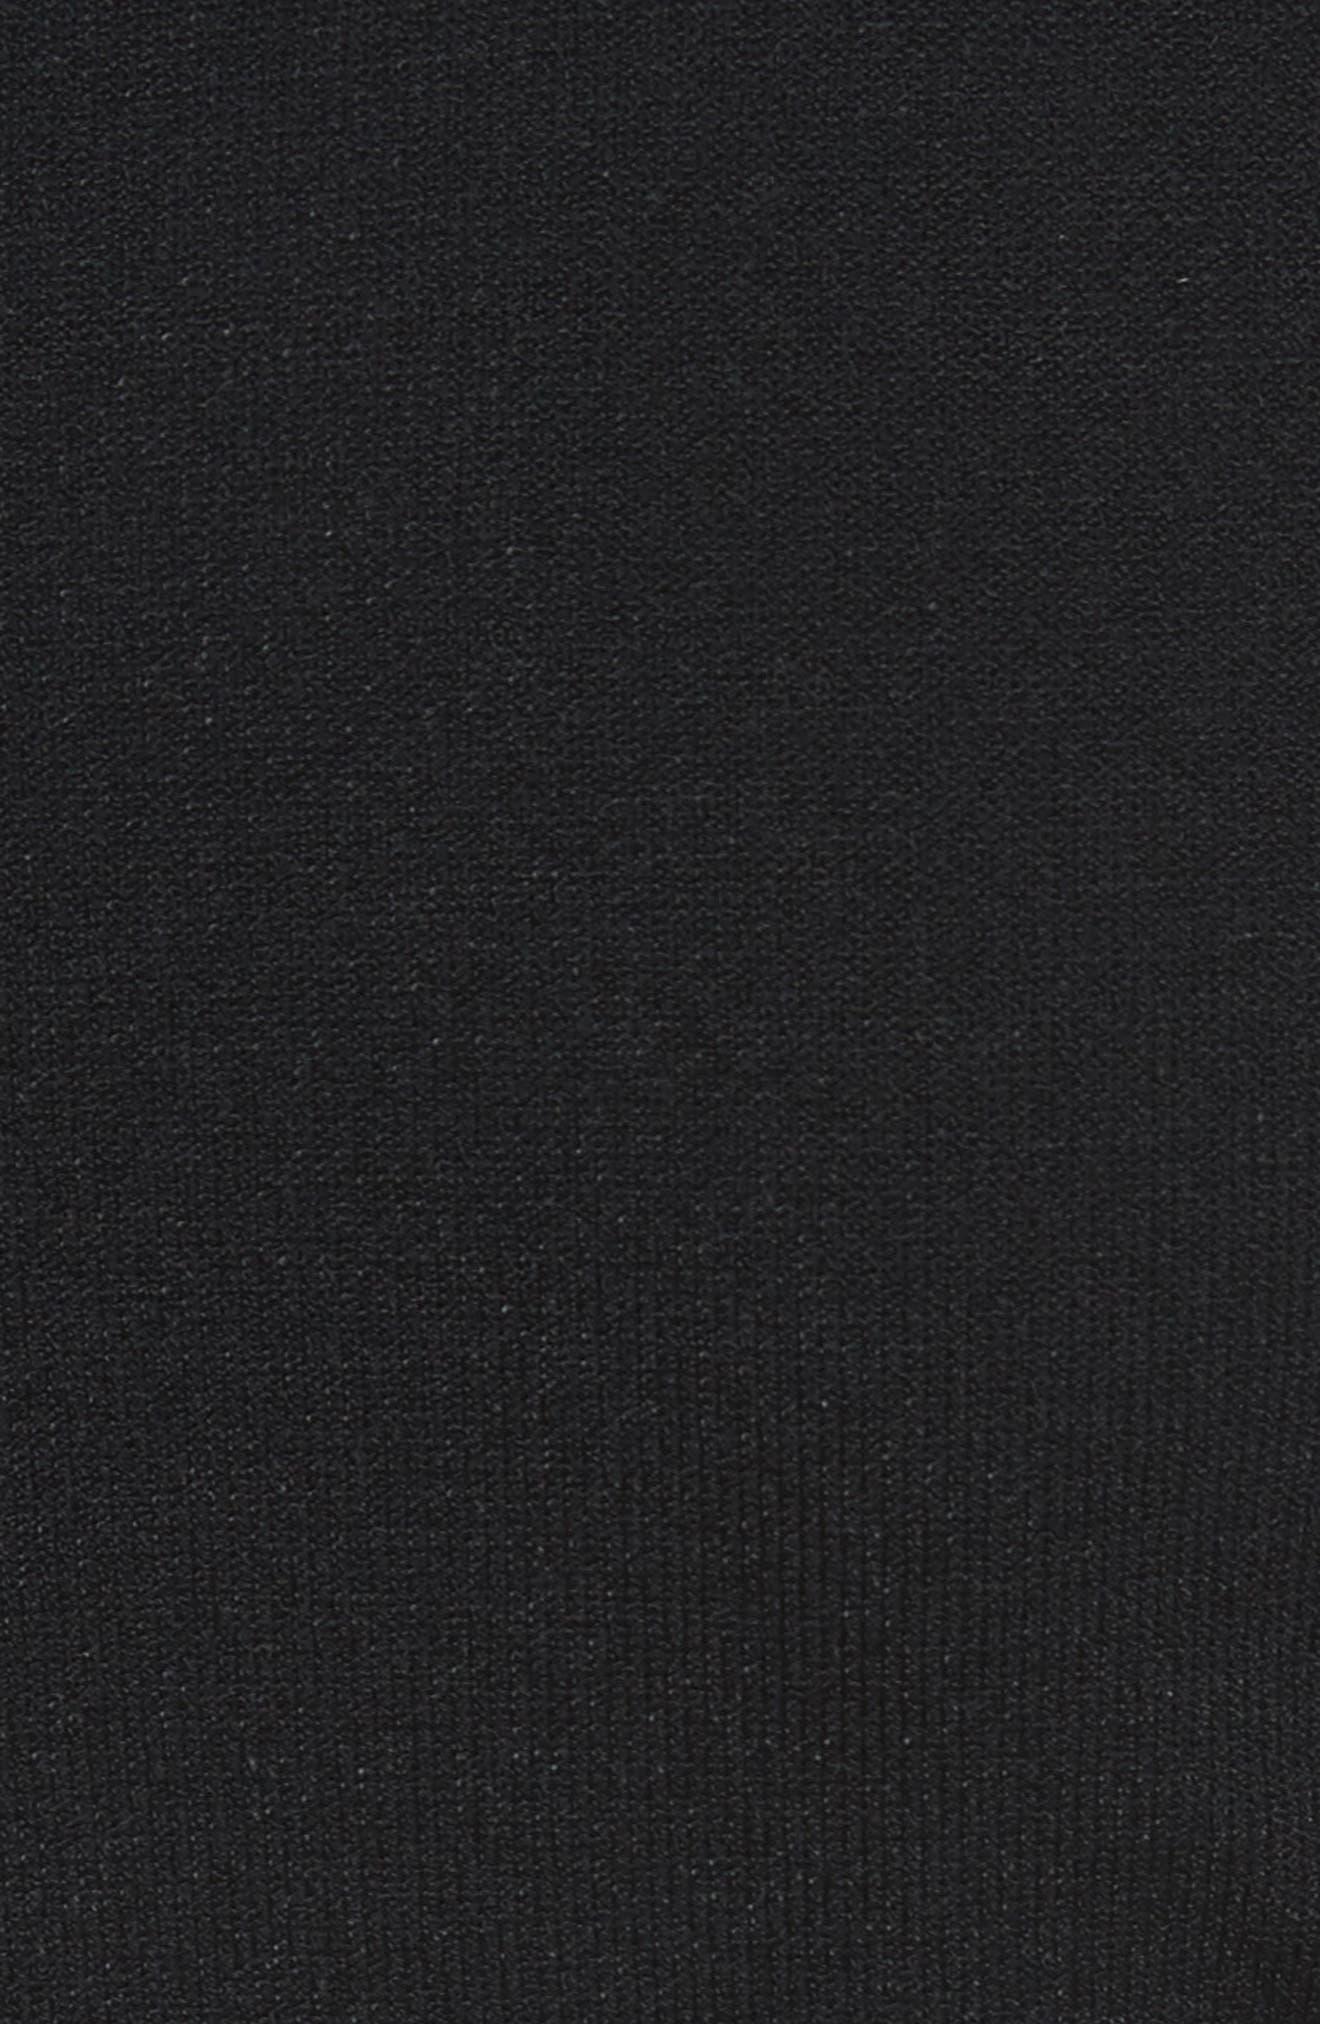 Intarsia Leaf Print Dress,                             Alternate thumbnail 6, color,                             White/ Black/ Evergreen